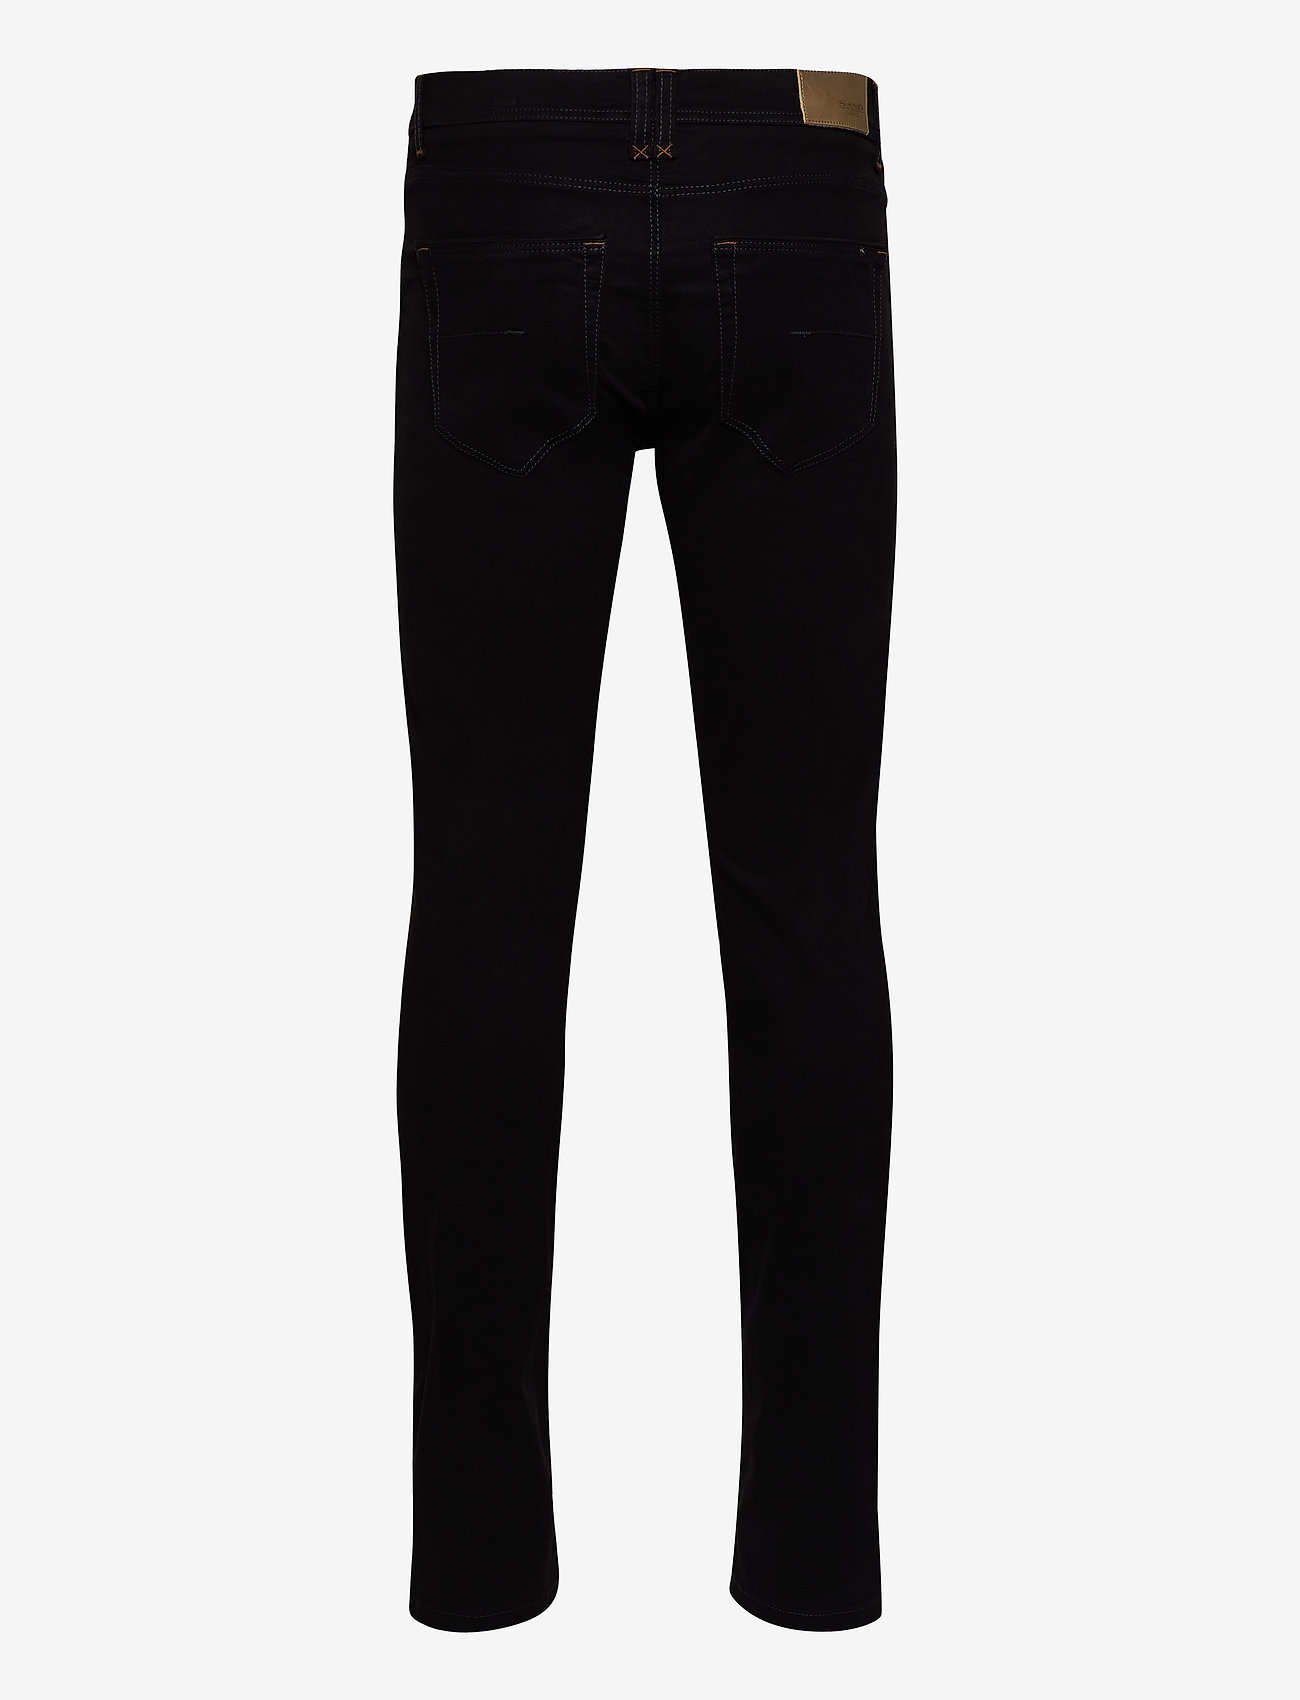 "SAND - Suede Touch - Burton NS 34"" - regular jeans - black - 1"